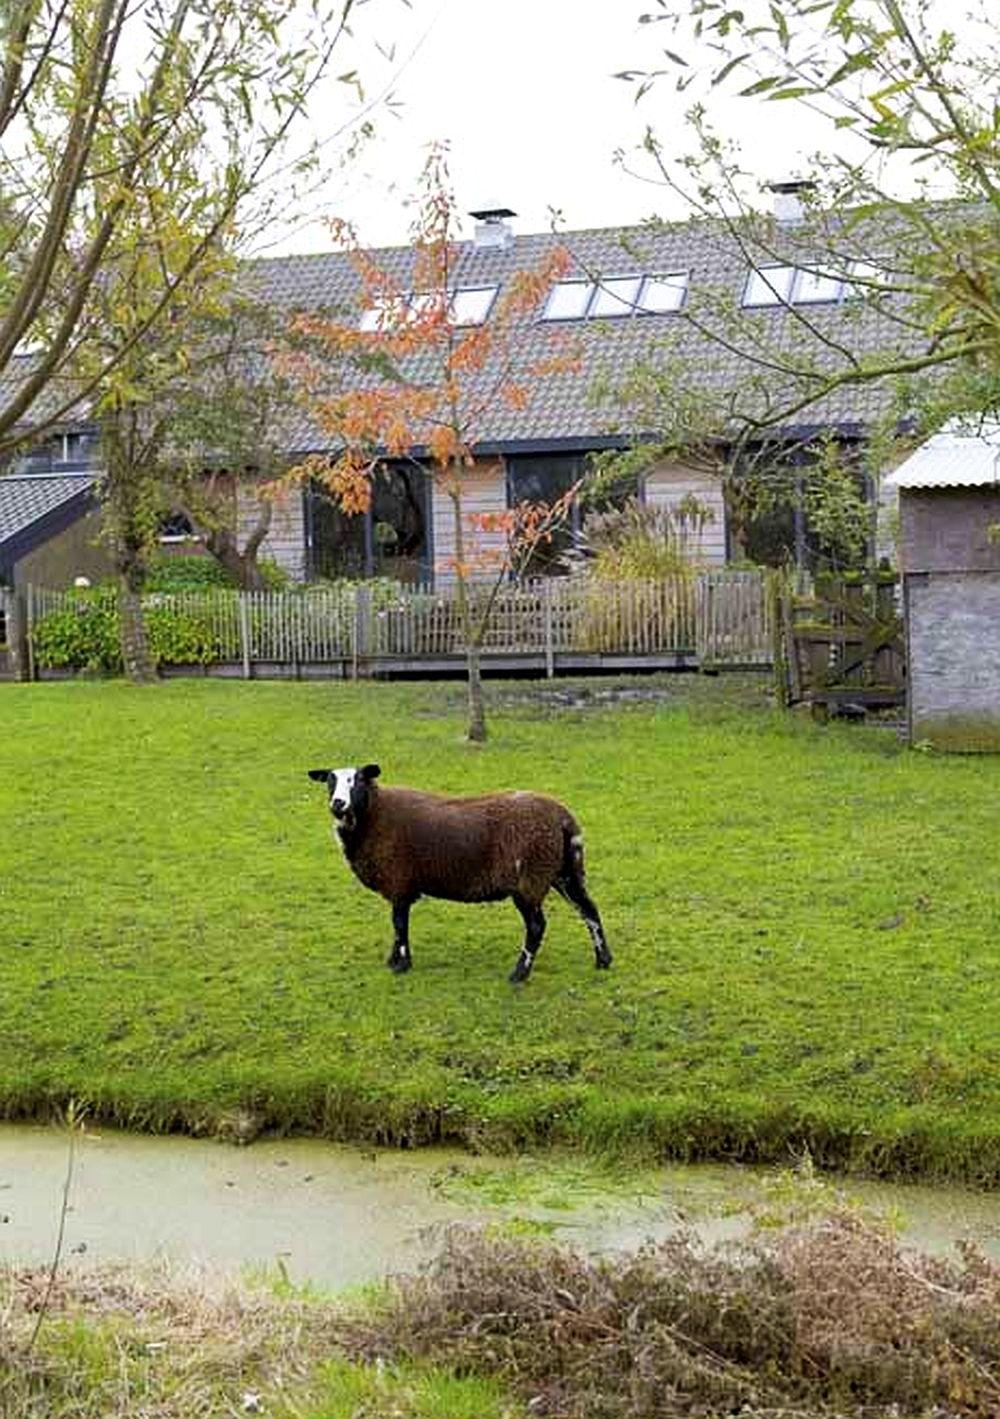 adelaparvu.com about modern farm, designer Larissa van Seumeren, Photo Viva Vida and Living Agency (4)